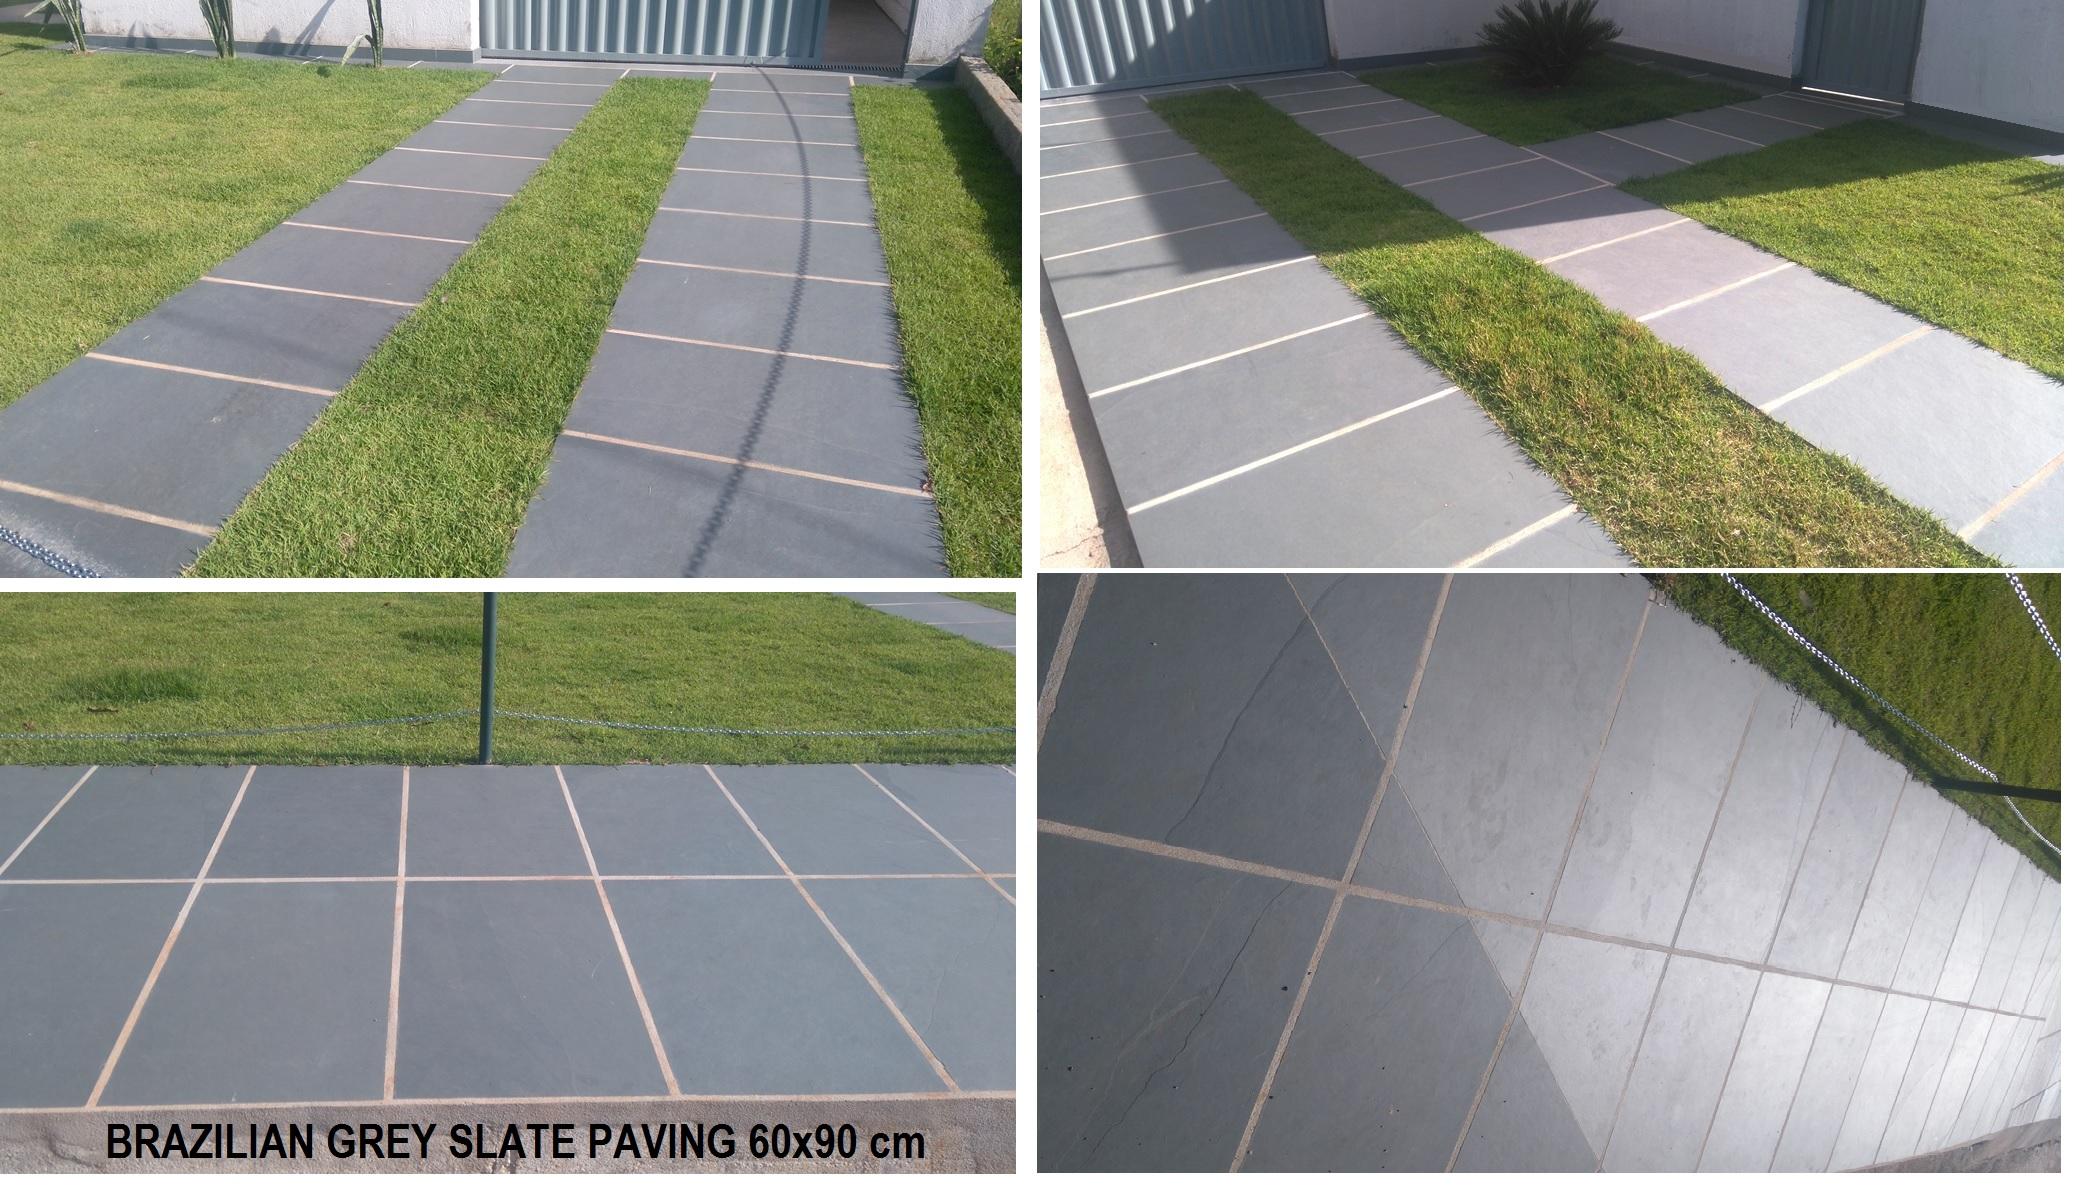 BRAZILIAN GREY SLATE PAVING 60x90 cm